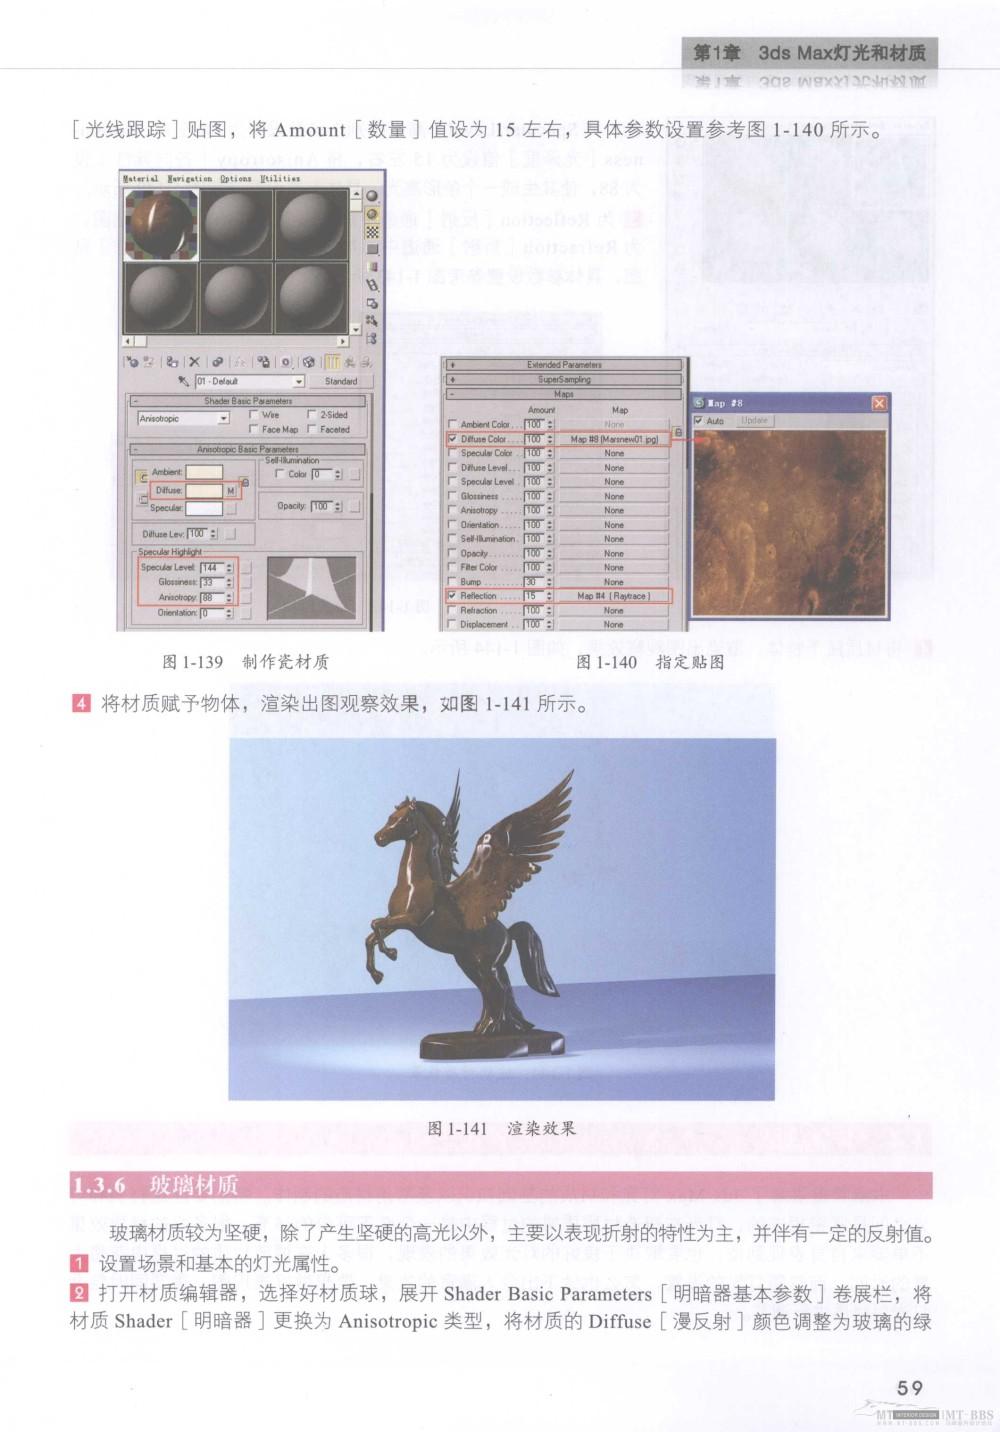 水晶石技法-3ds_Max&VRay室内空间表现_水晶石技法-3ds_Max&VRay室内空间表现_页面_065.jpg